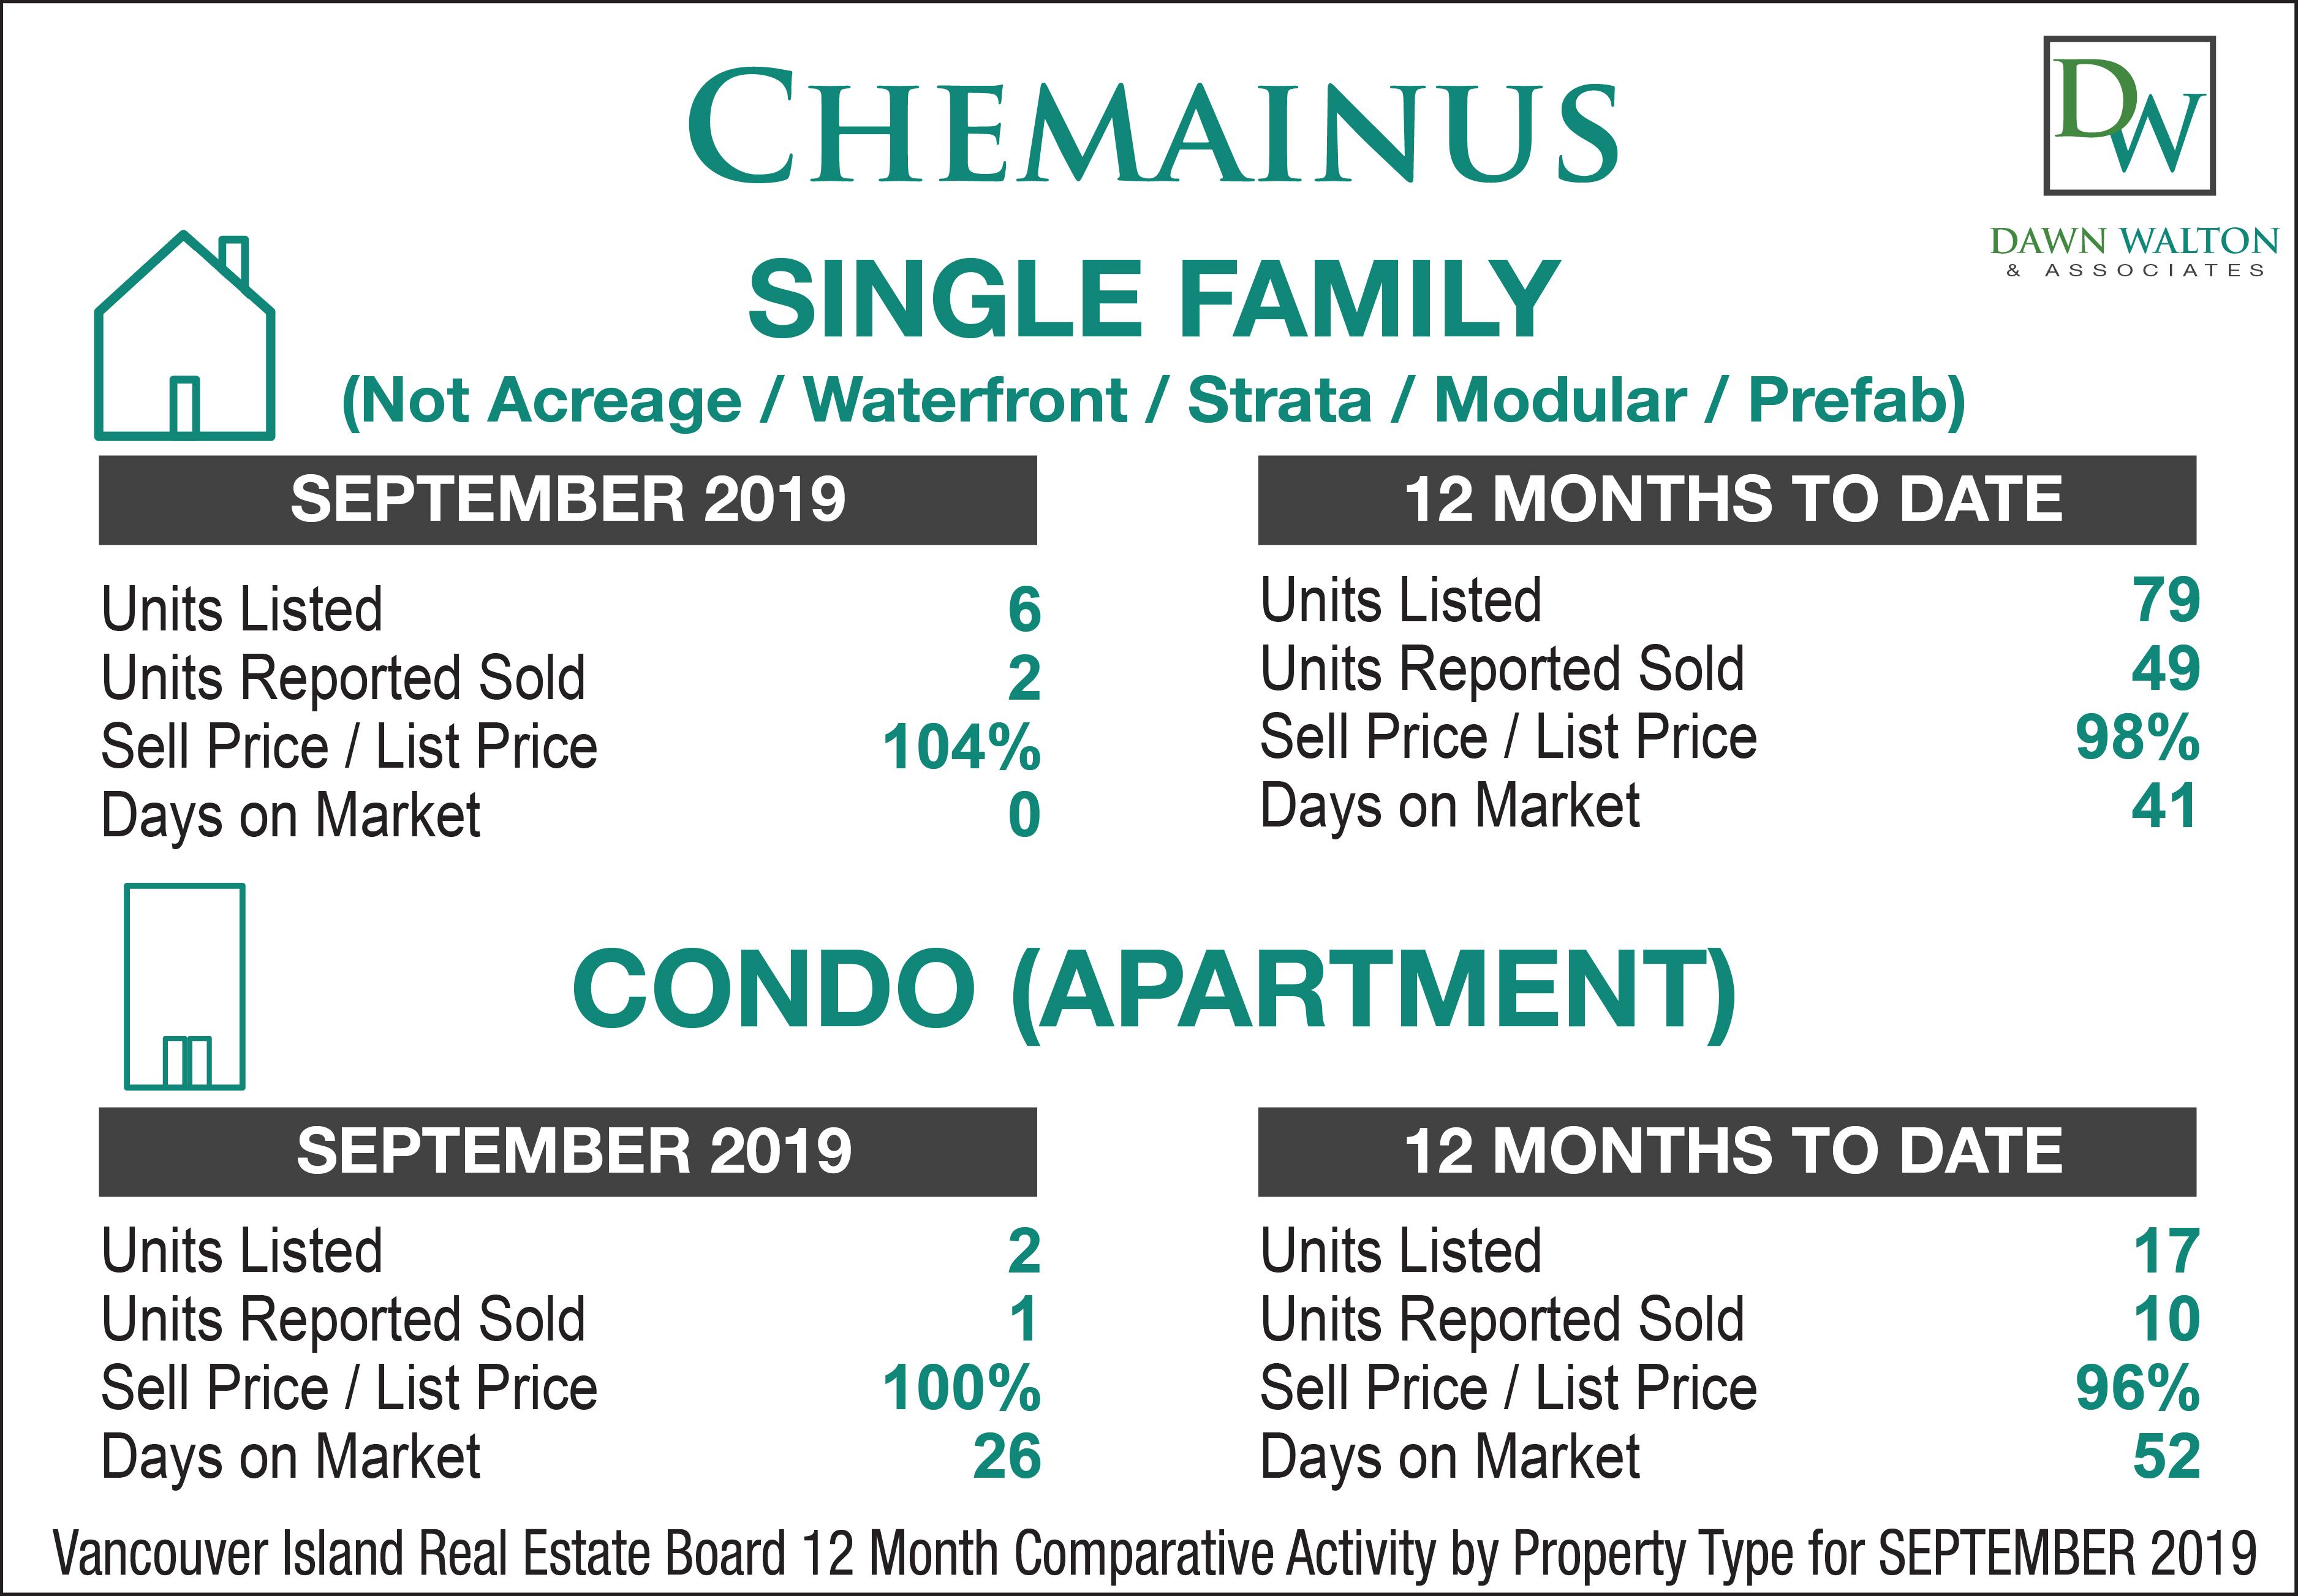 Chemainus Real Estate Market Stats September 2019 - Nanaimo Realtor Dawn Walton